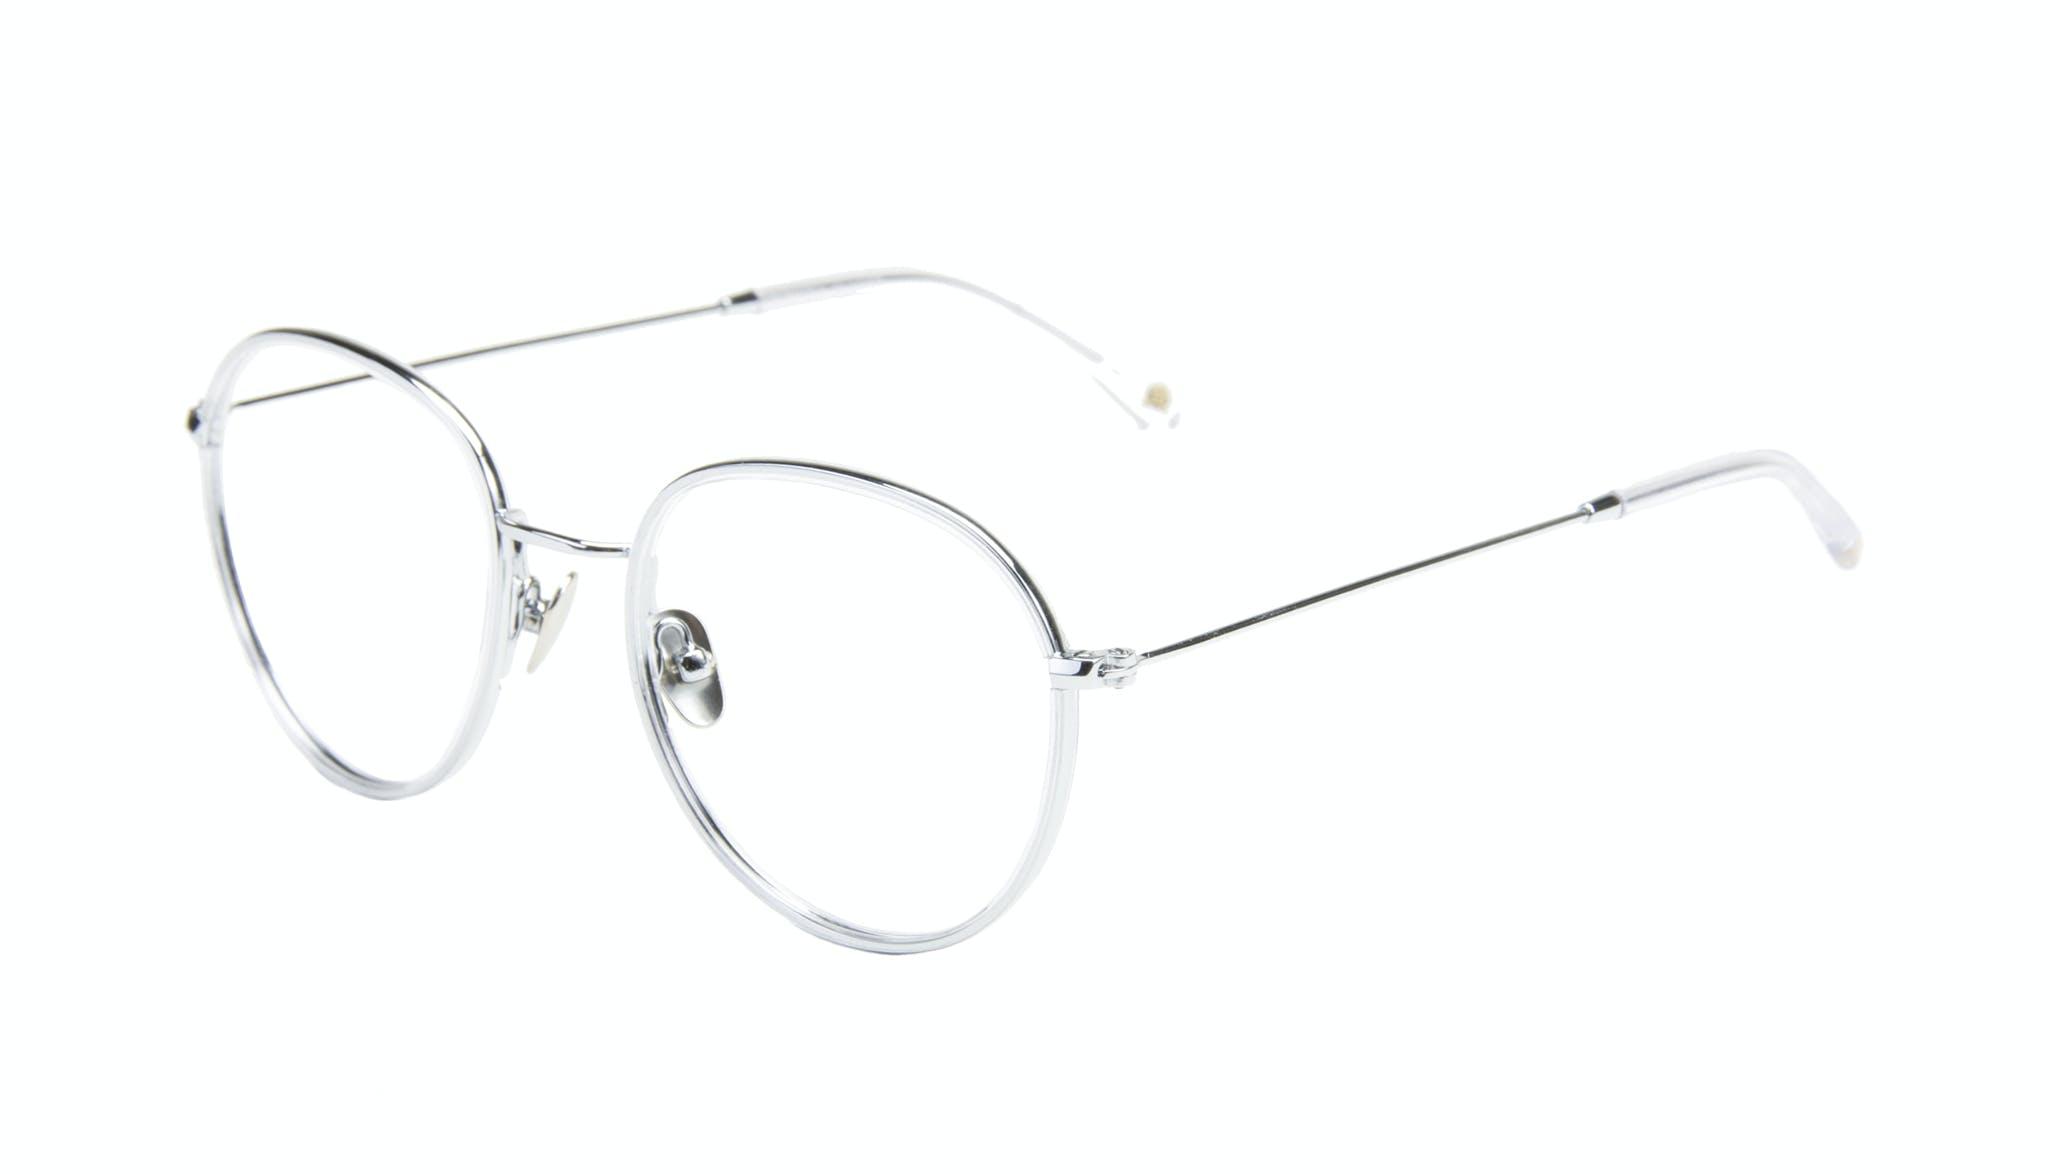 Affordable Fashion Glasses Aviator Round Eyeglasses Women Subrosa Glacier Tilt